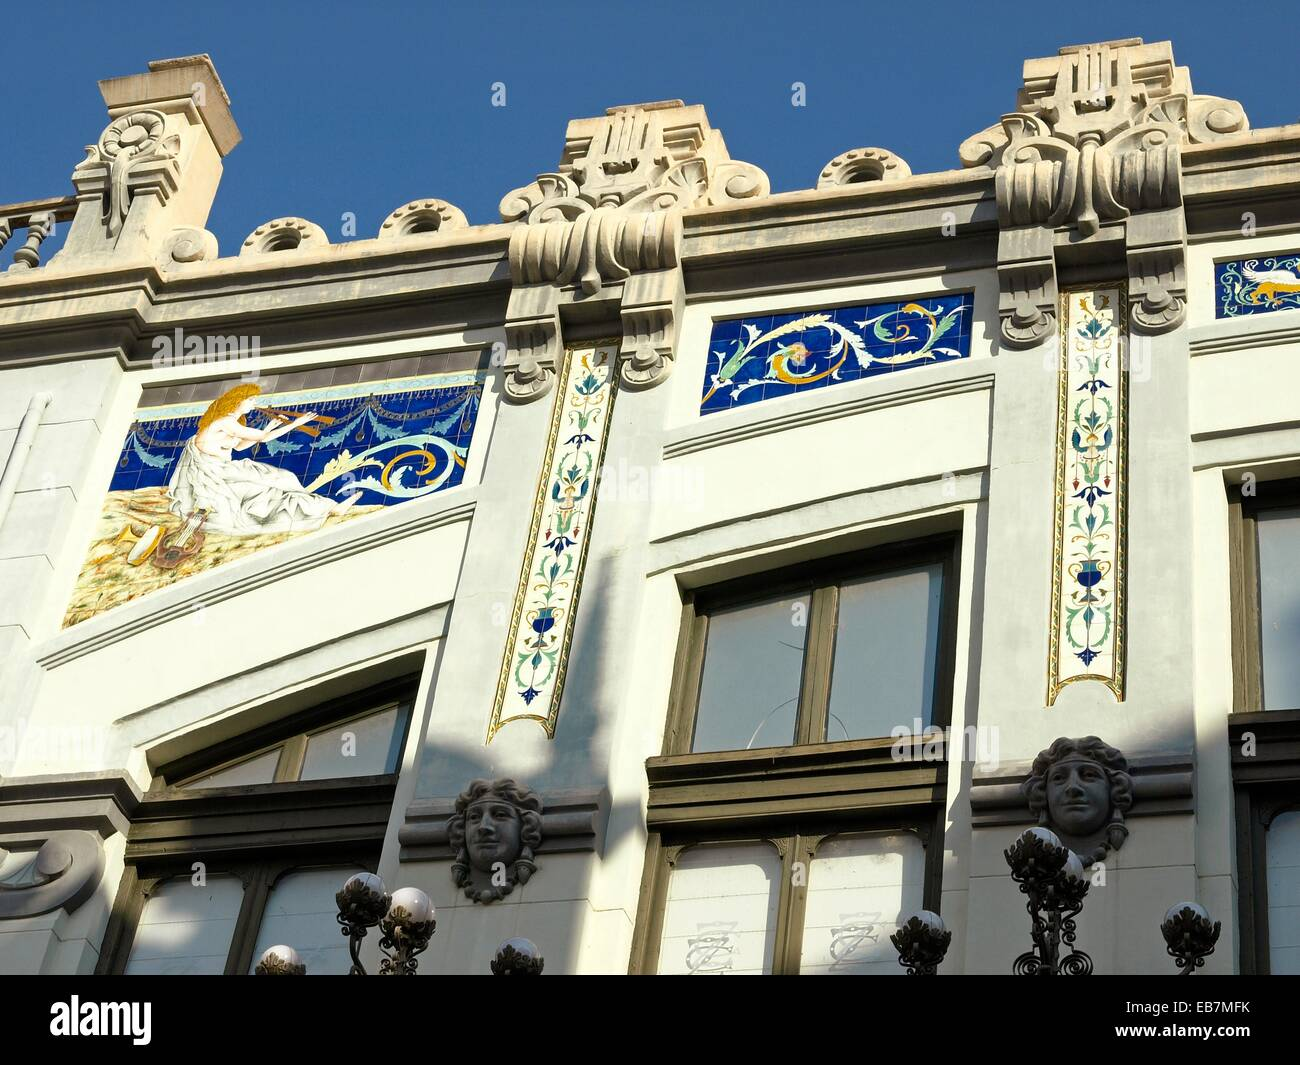 modernism architecture in Zamora - Stock Image